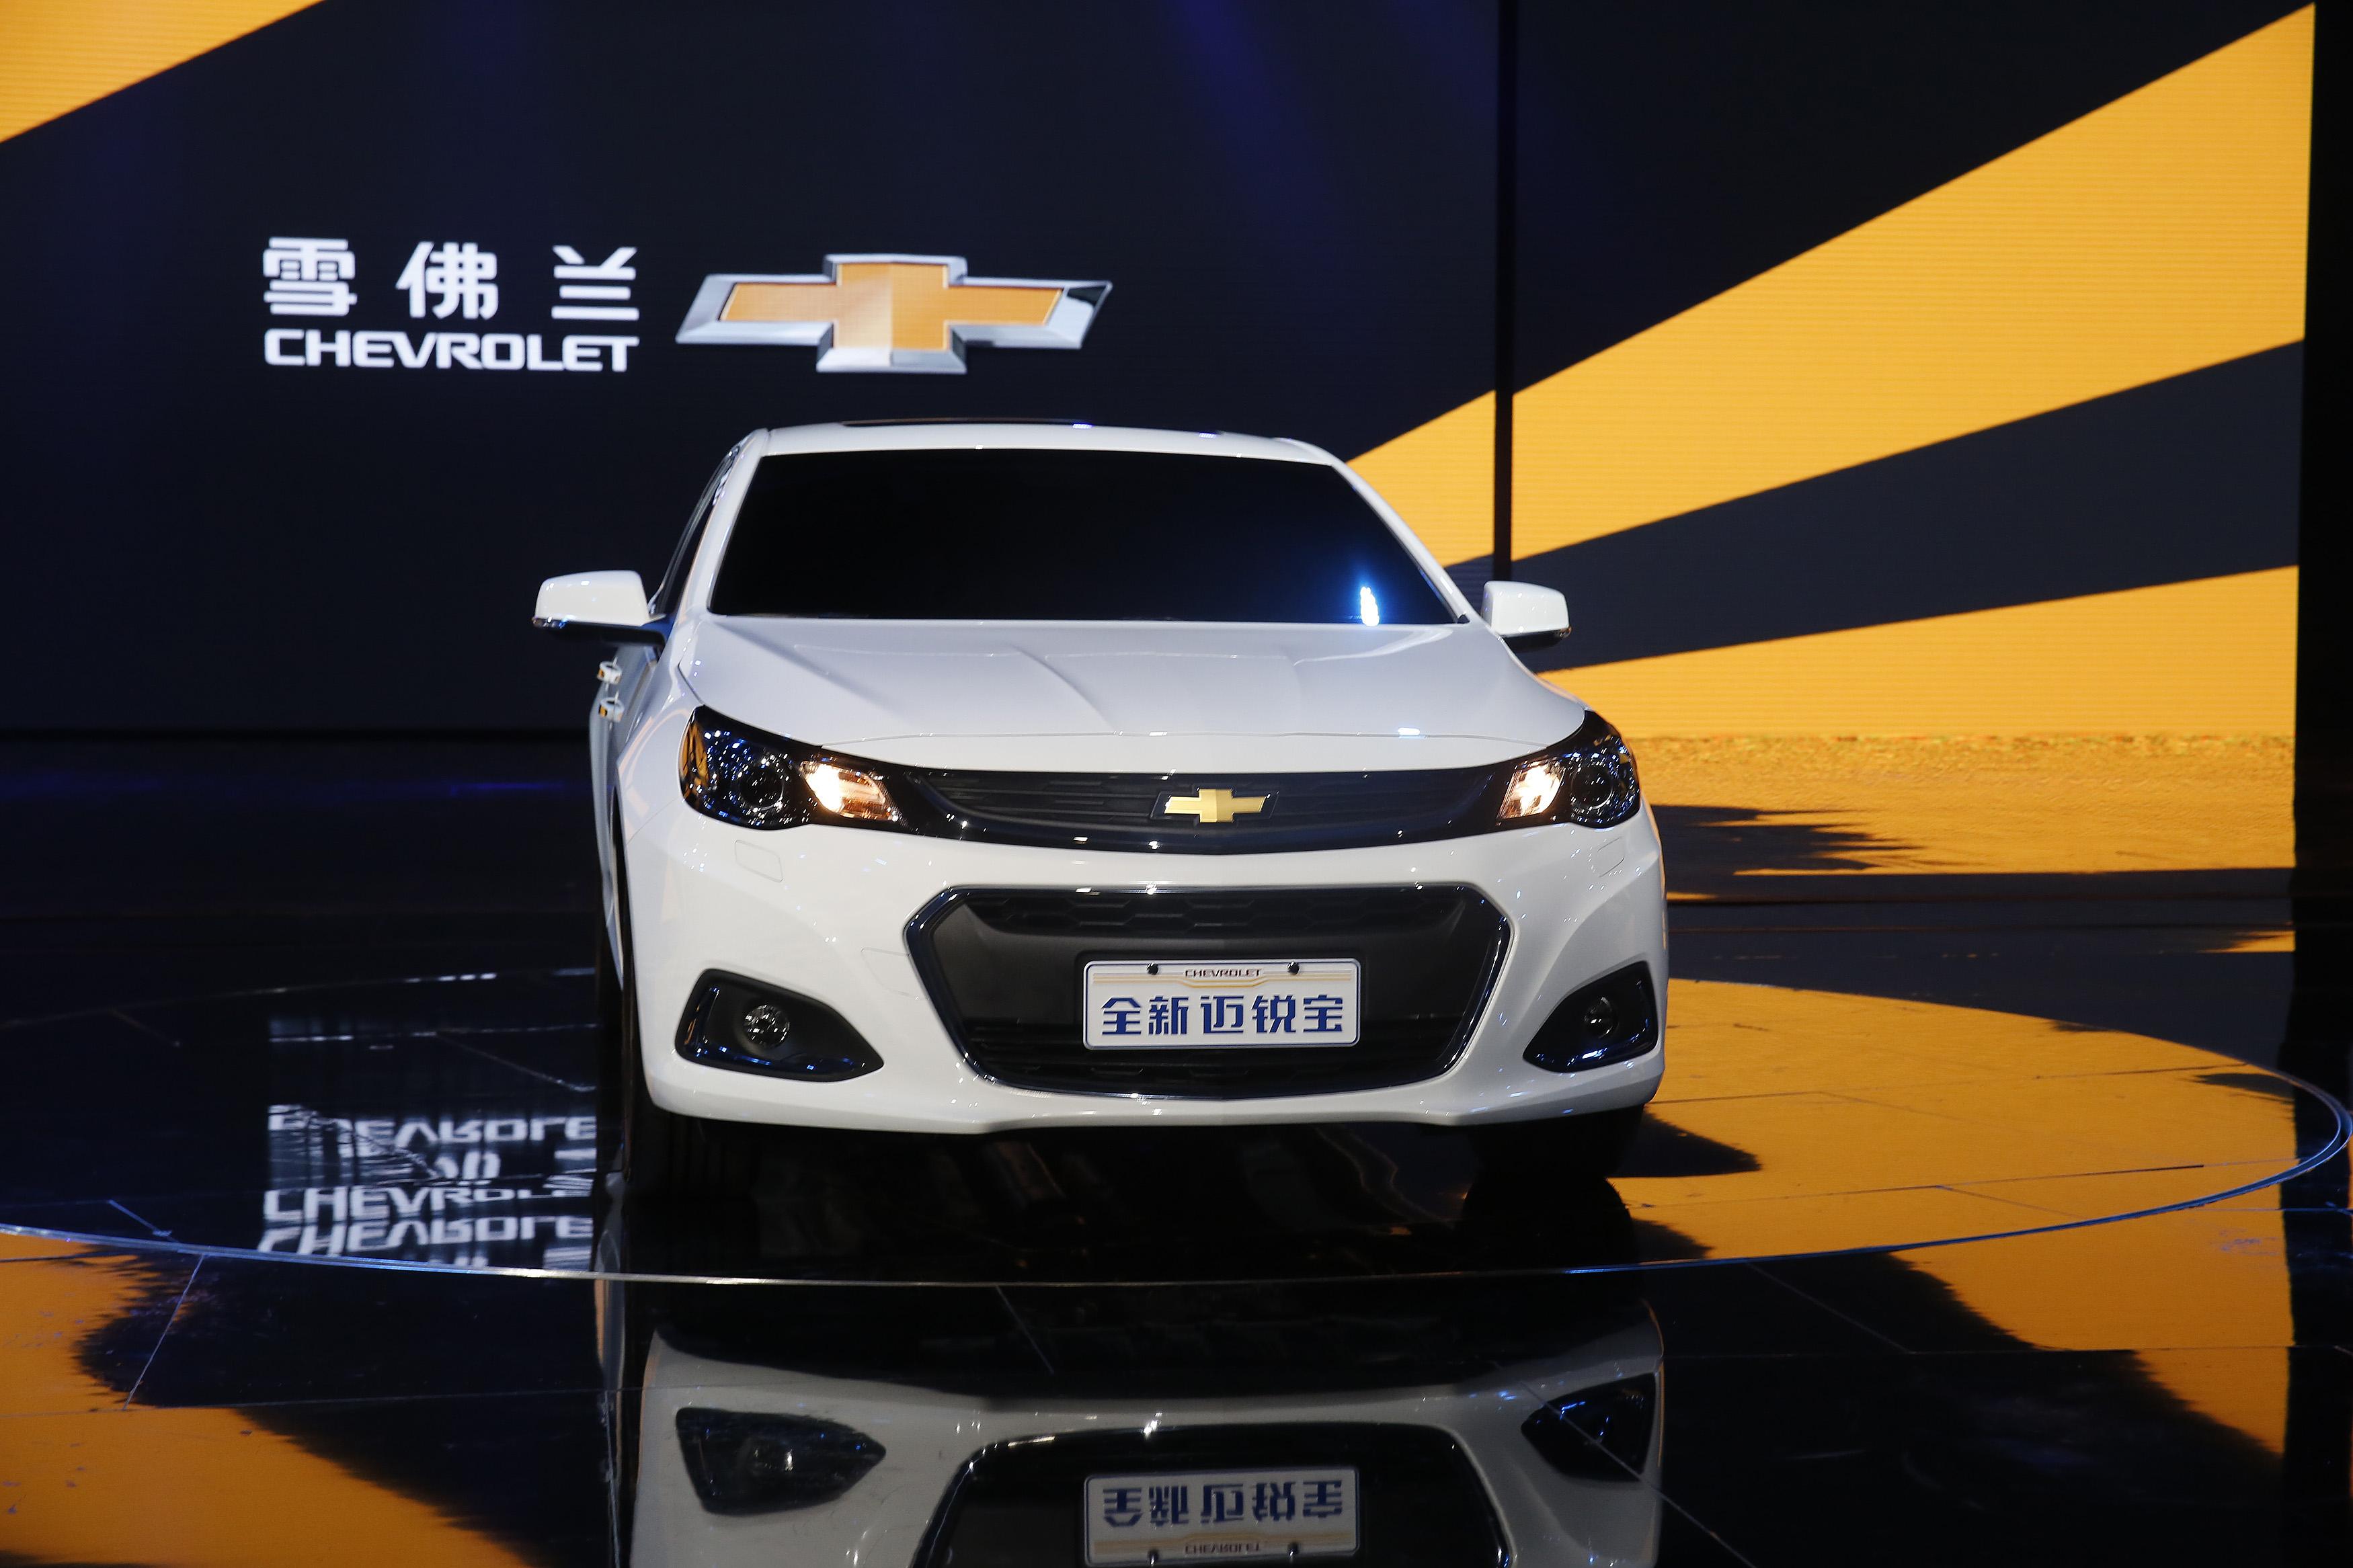 Chevrolet fnr and all new chevrolet malibu make global debut at shanghai gm gala night